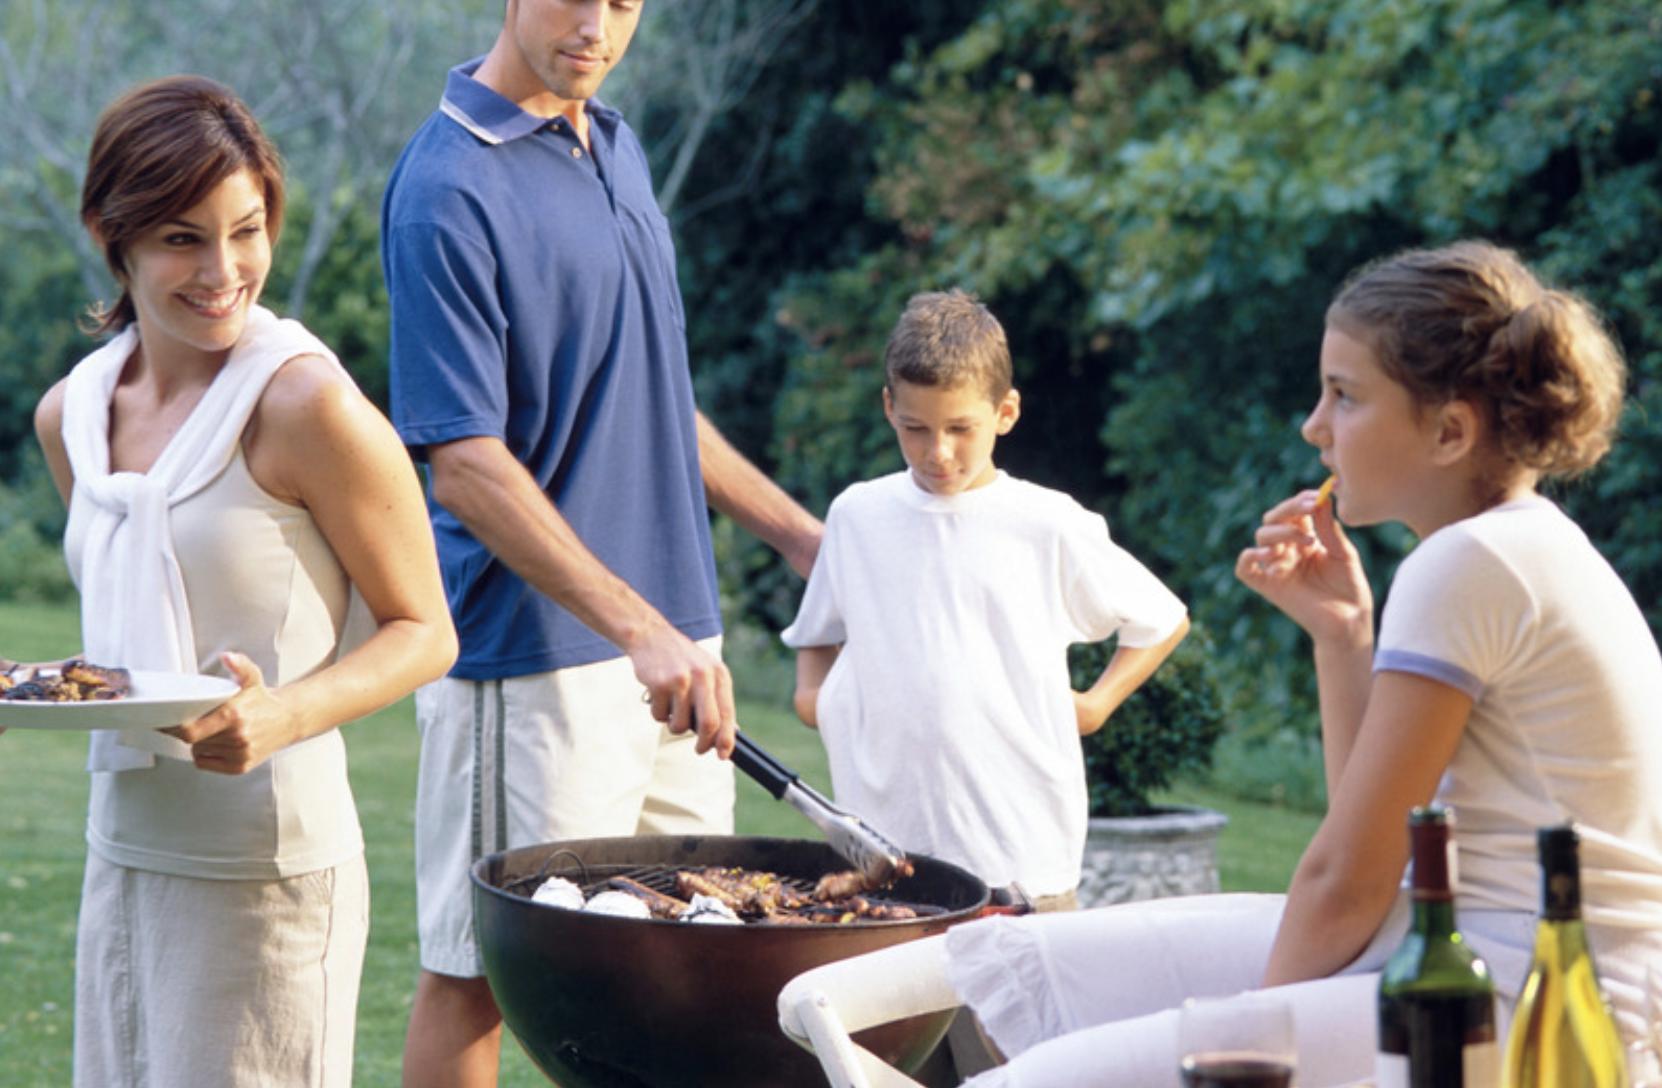 Fun Ways to Enjoy Your Backyard This Summer